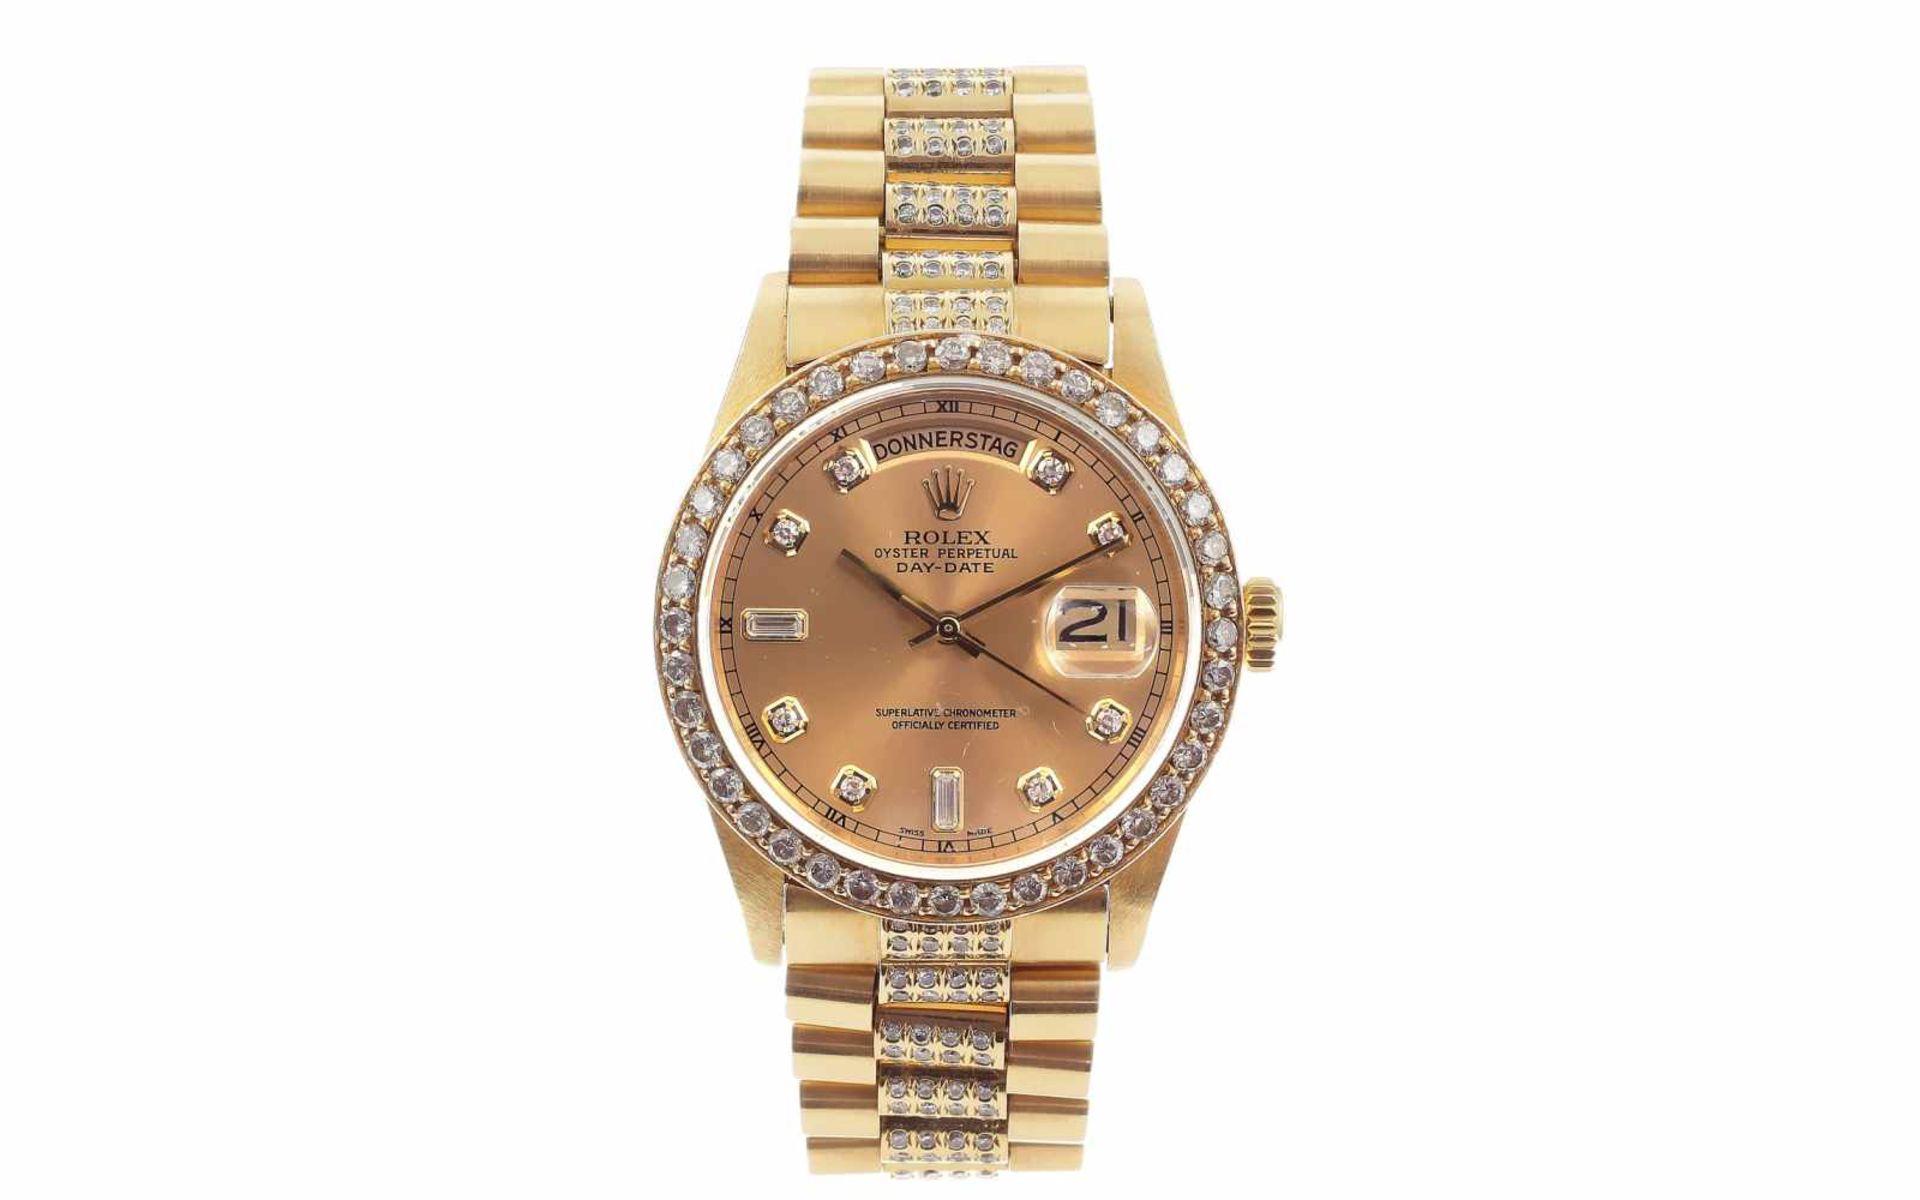 Los 46 - ArmbanduhrRolex Day-Date Ref. 18038 Automatik 750/- Gelbgold mit Diamantbesatz